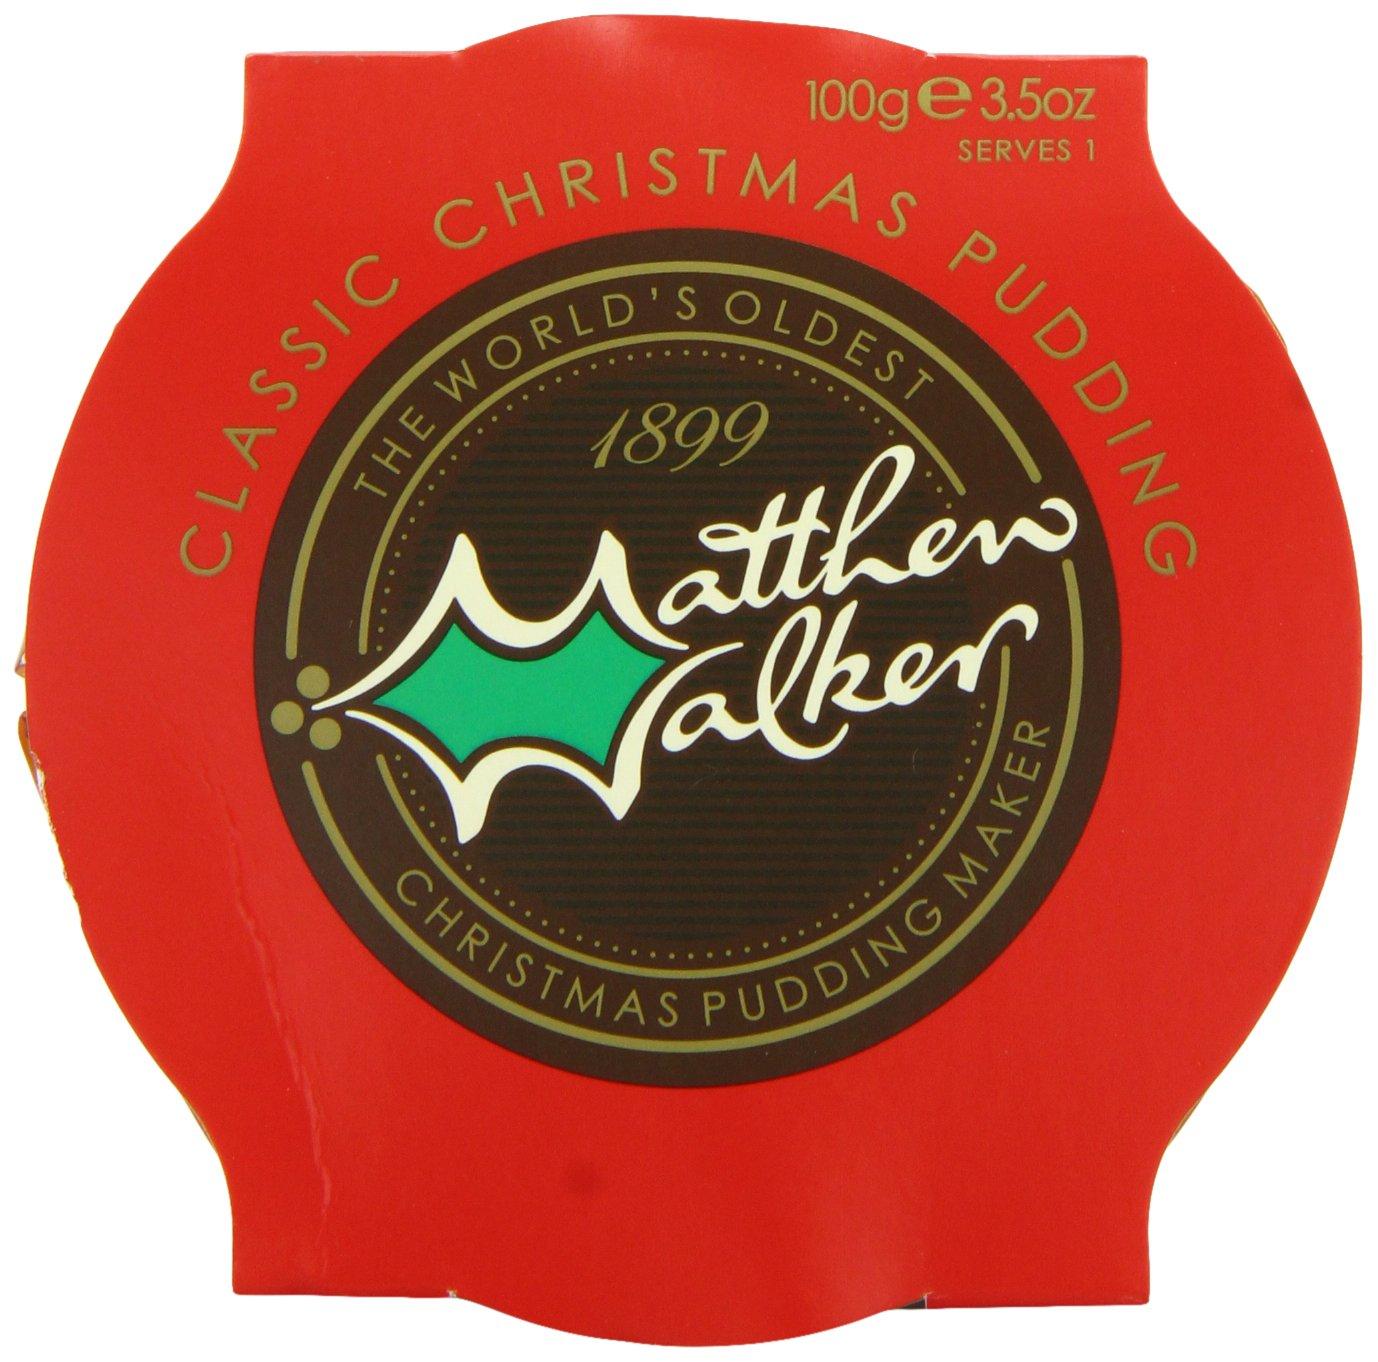 Matthew Walker Classic Christmas Pudding 100 G (Pack Of 40)